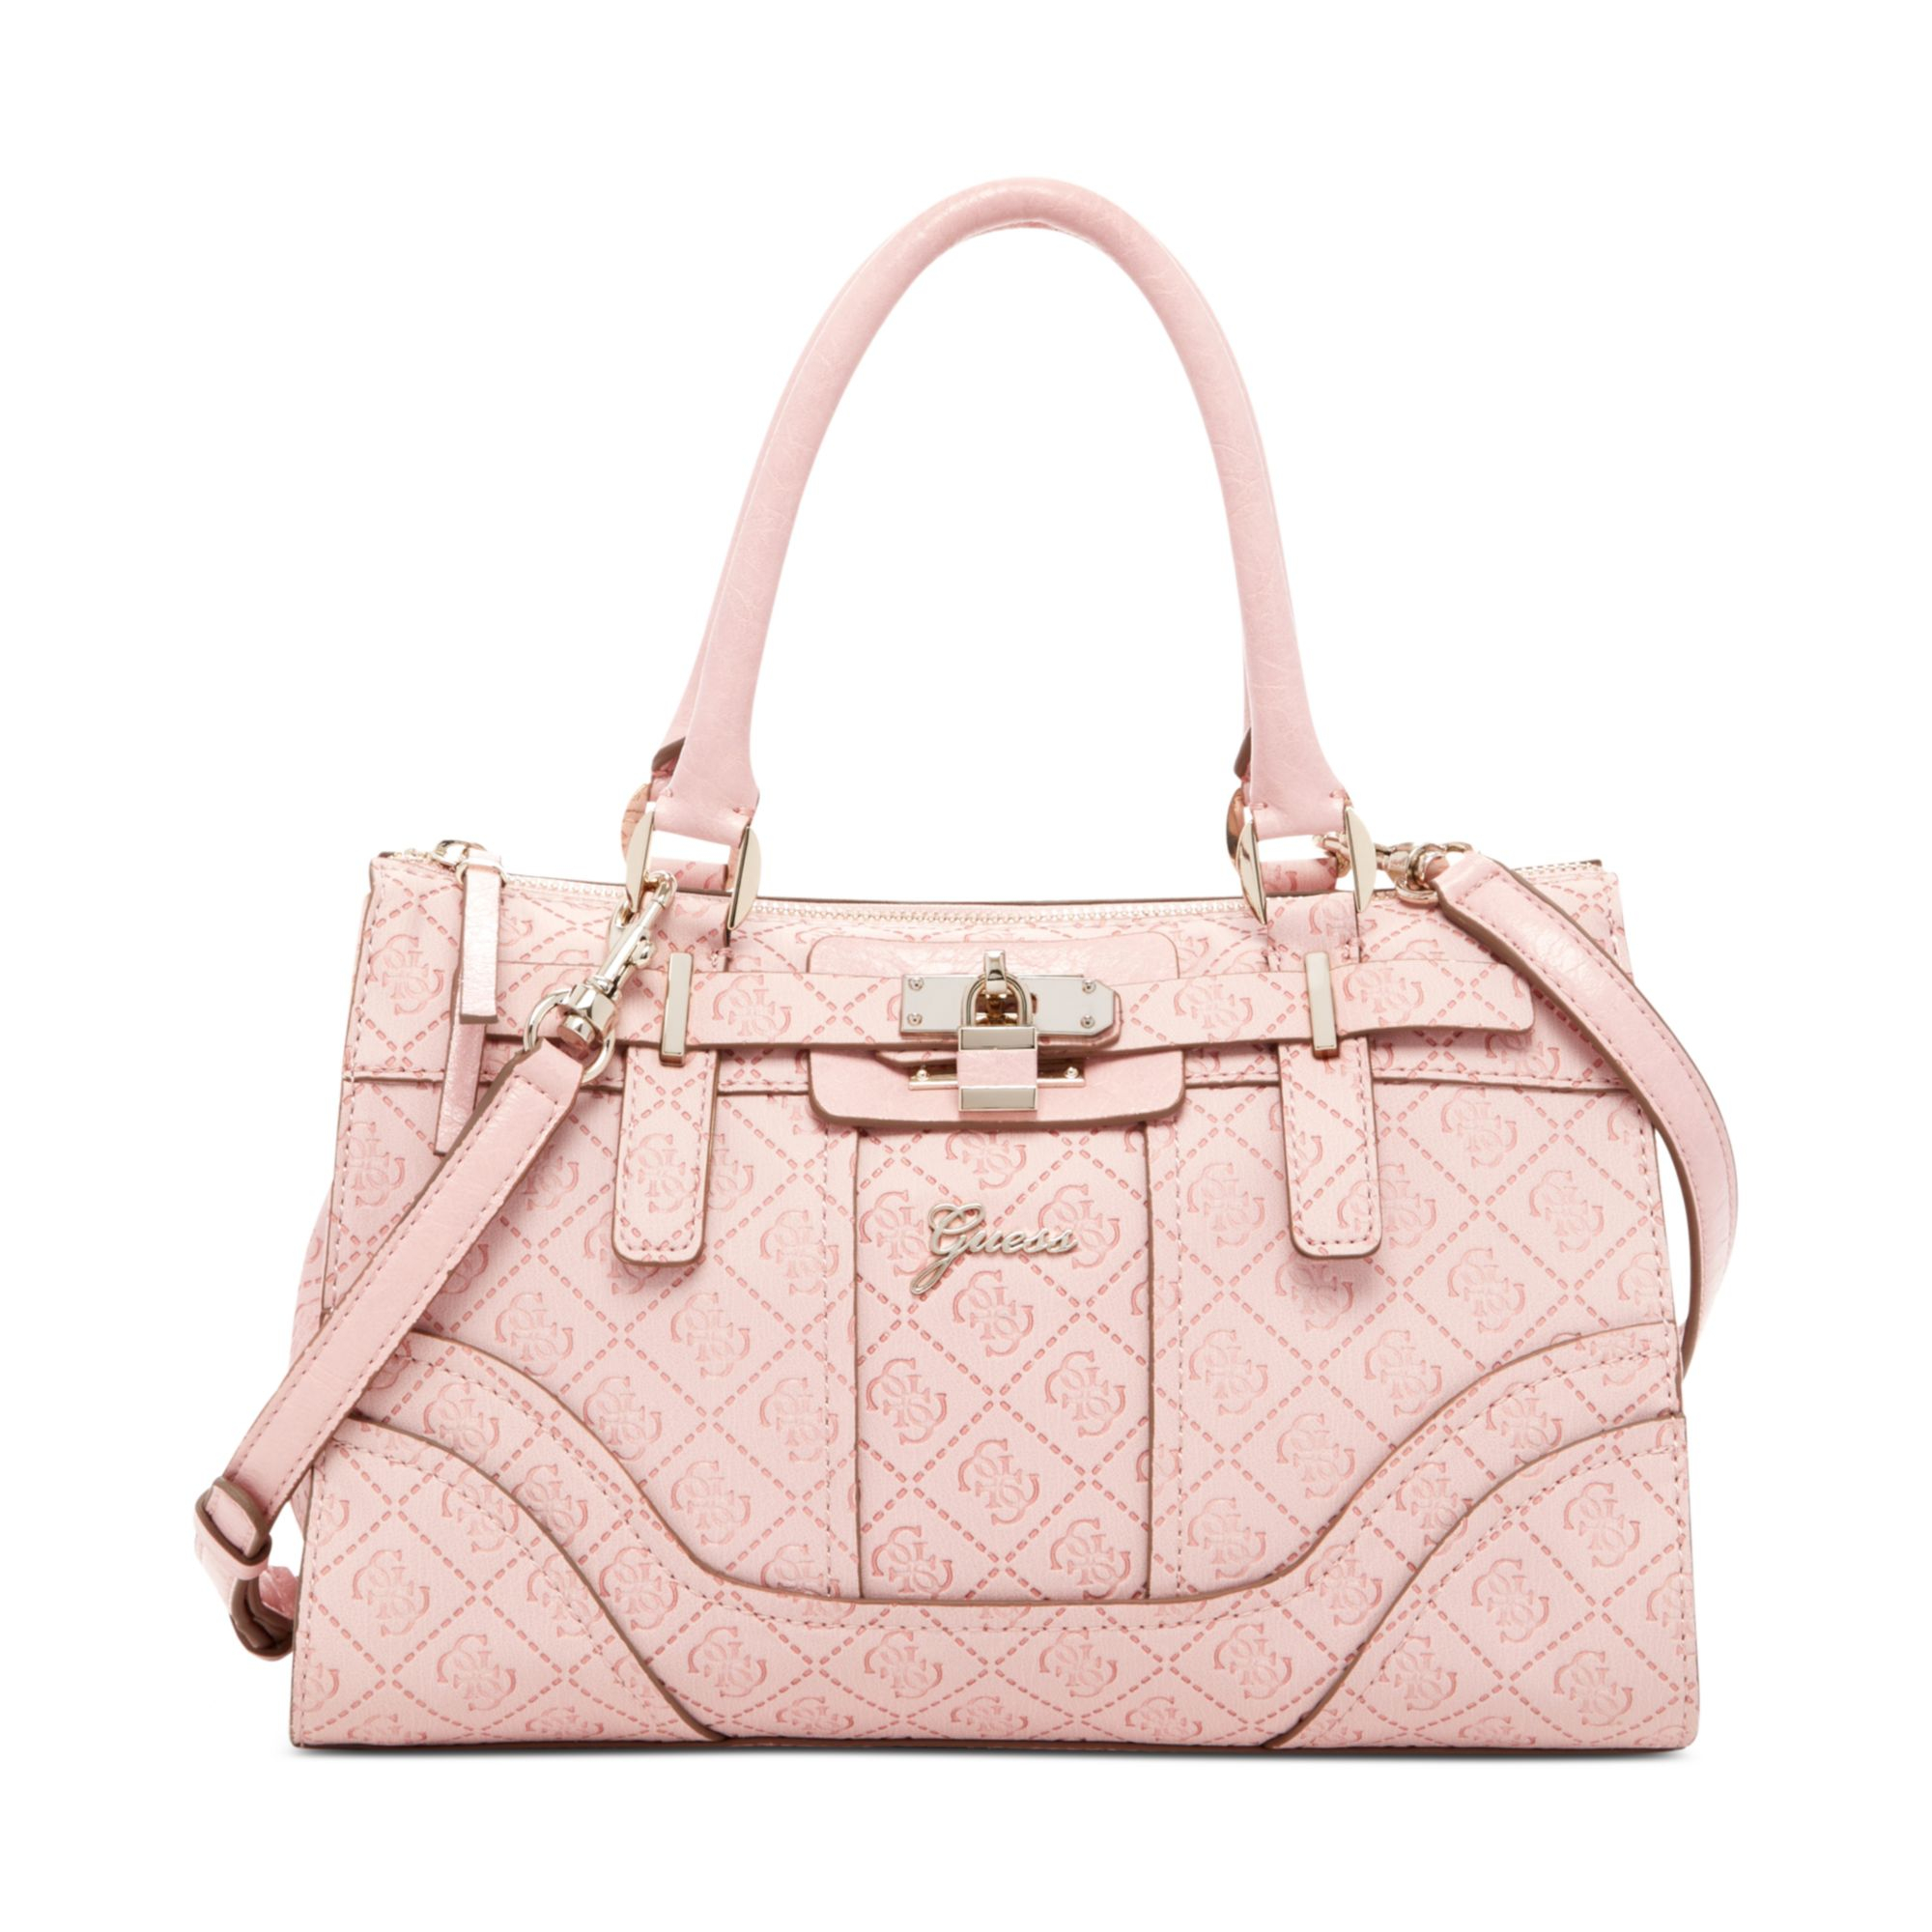 b9dc6aa32800 Pink Guess Purses Handbags - Best Purse Image Ccdbb.Org